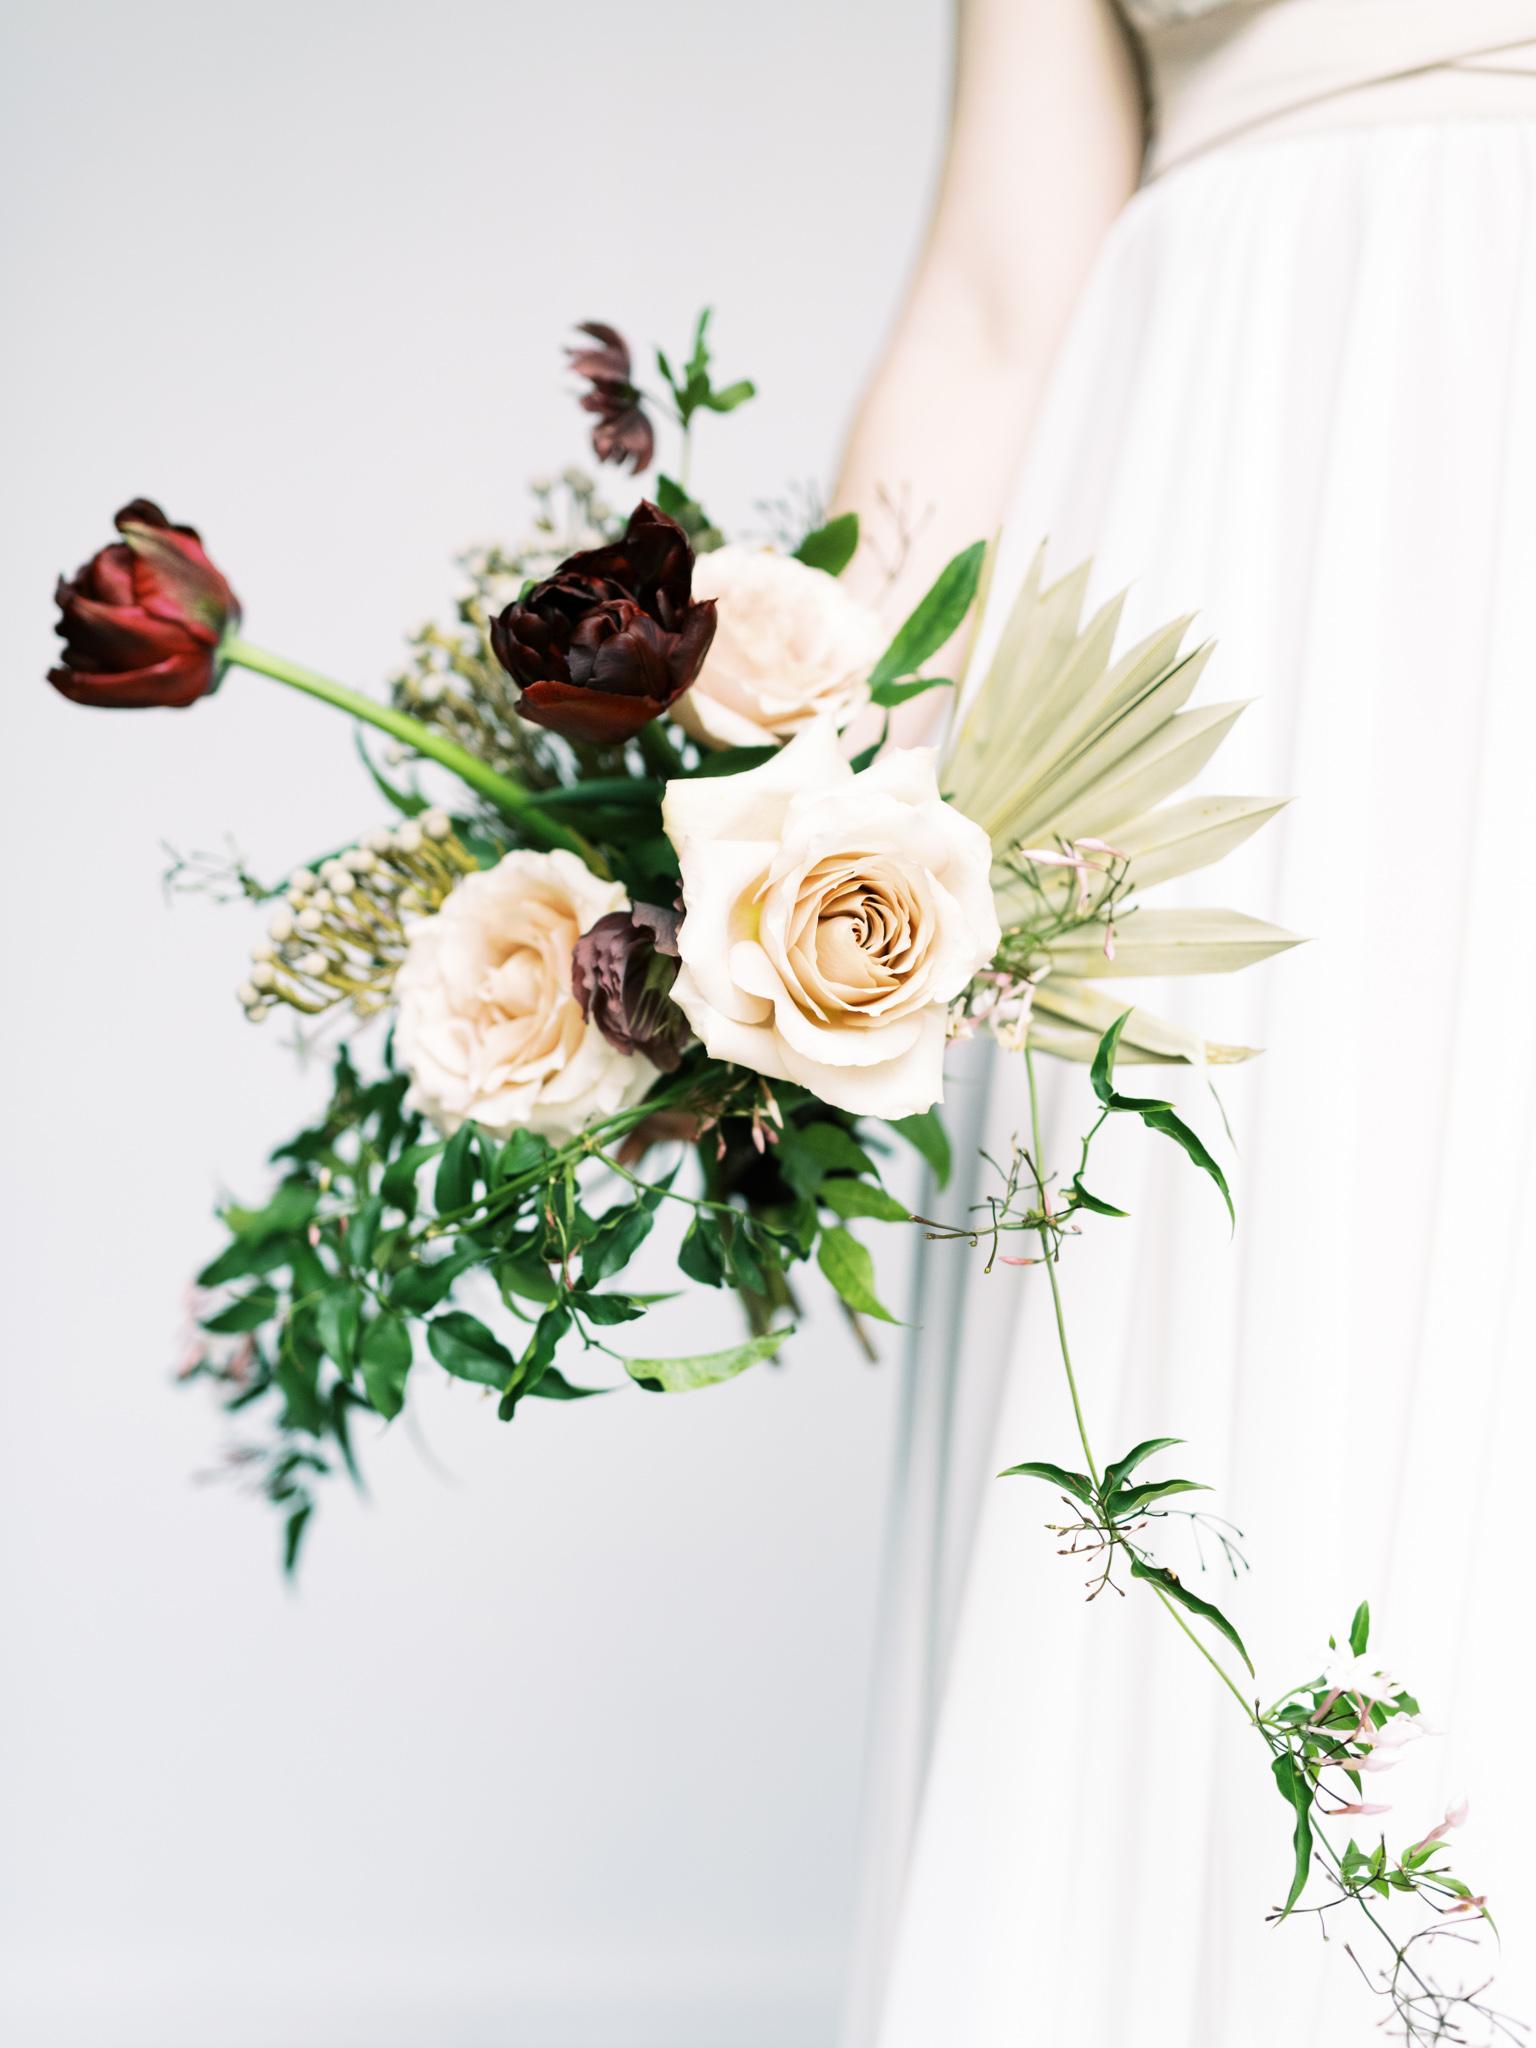 Cultivate Goods Floral Workshop - The Doyle - Kristen Krehbiel - Kristen Kay Photography-107.jpg